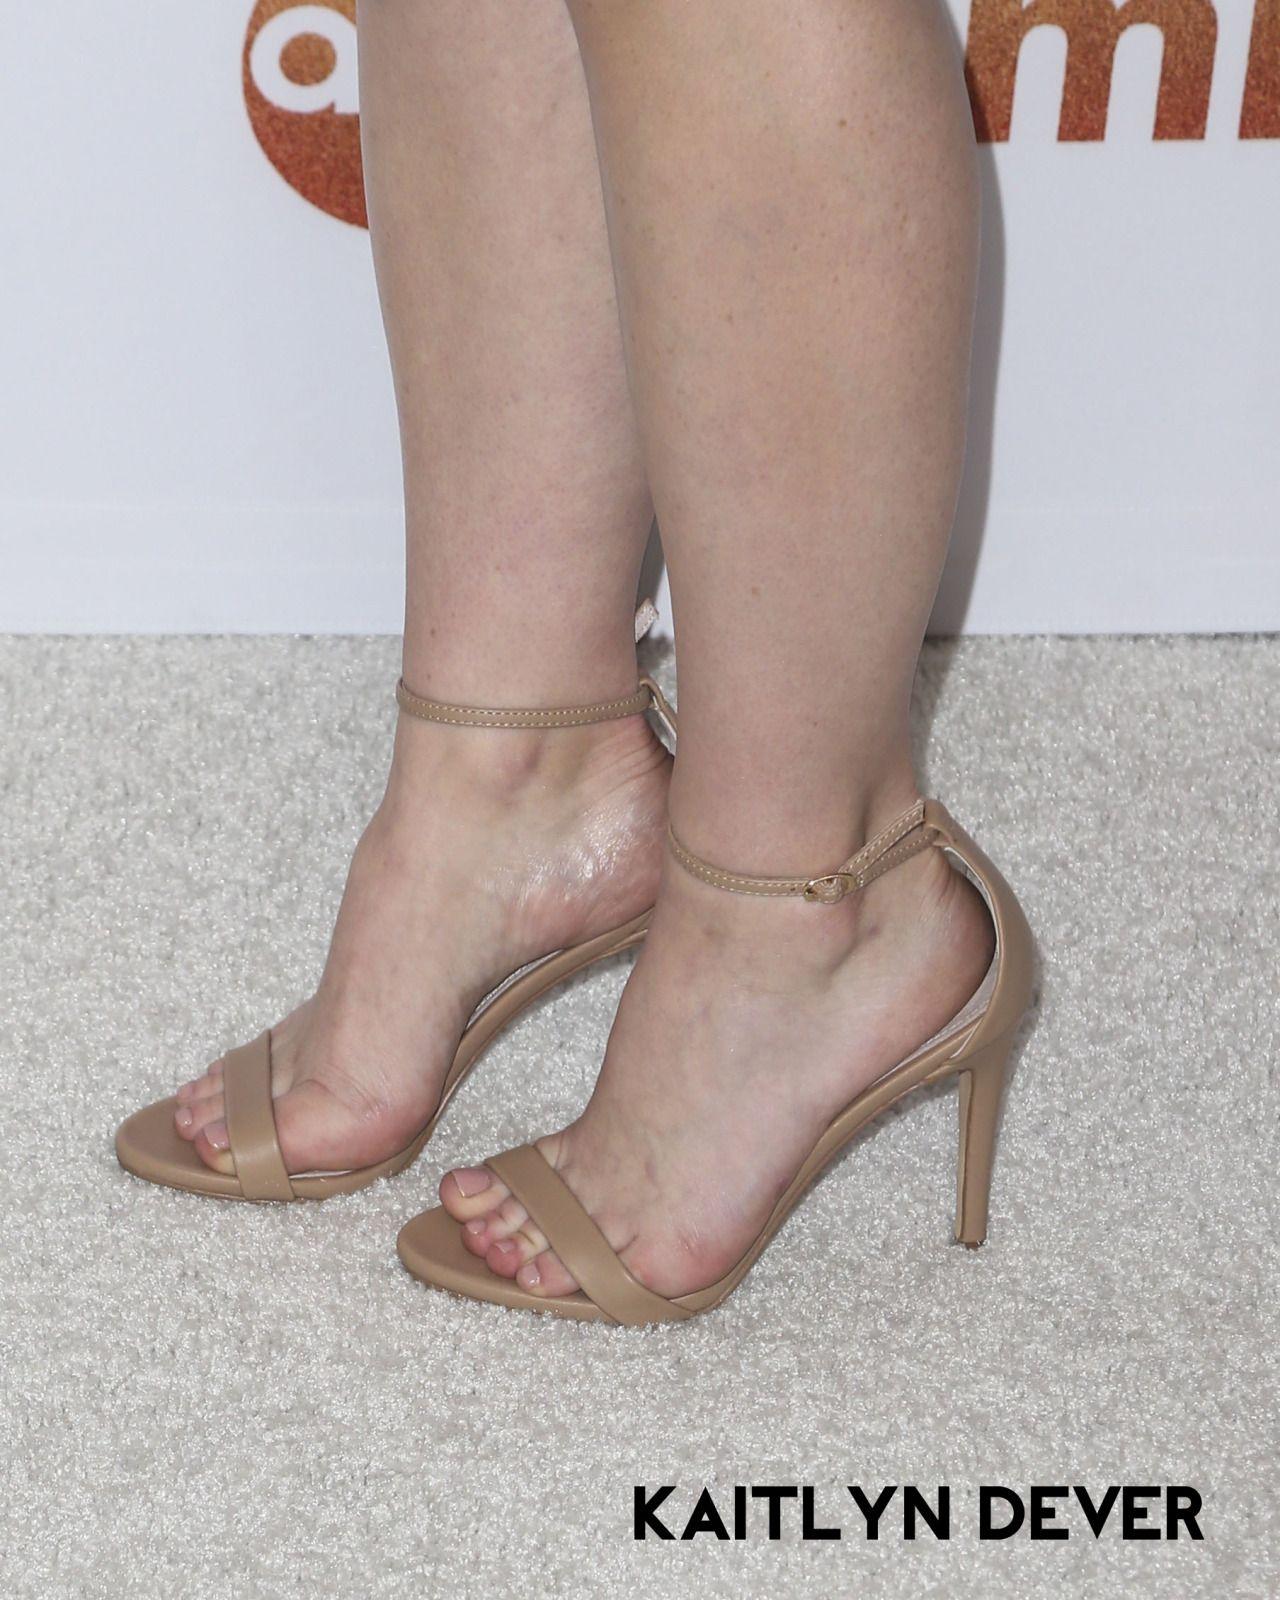 Pin On Celebrities Models Feet